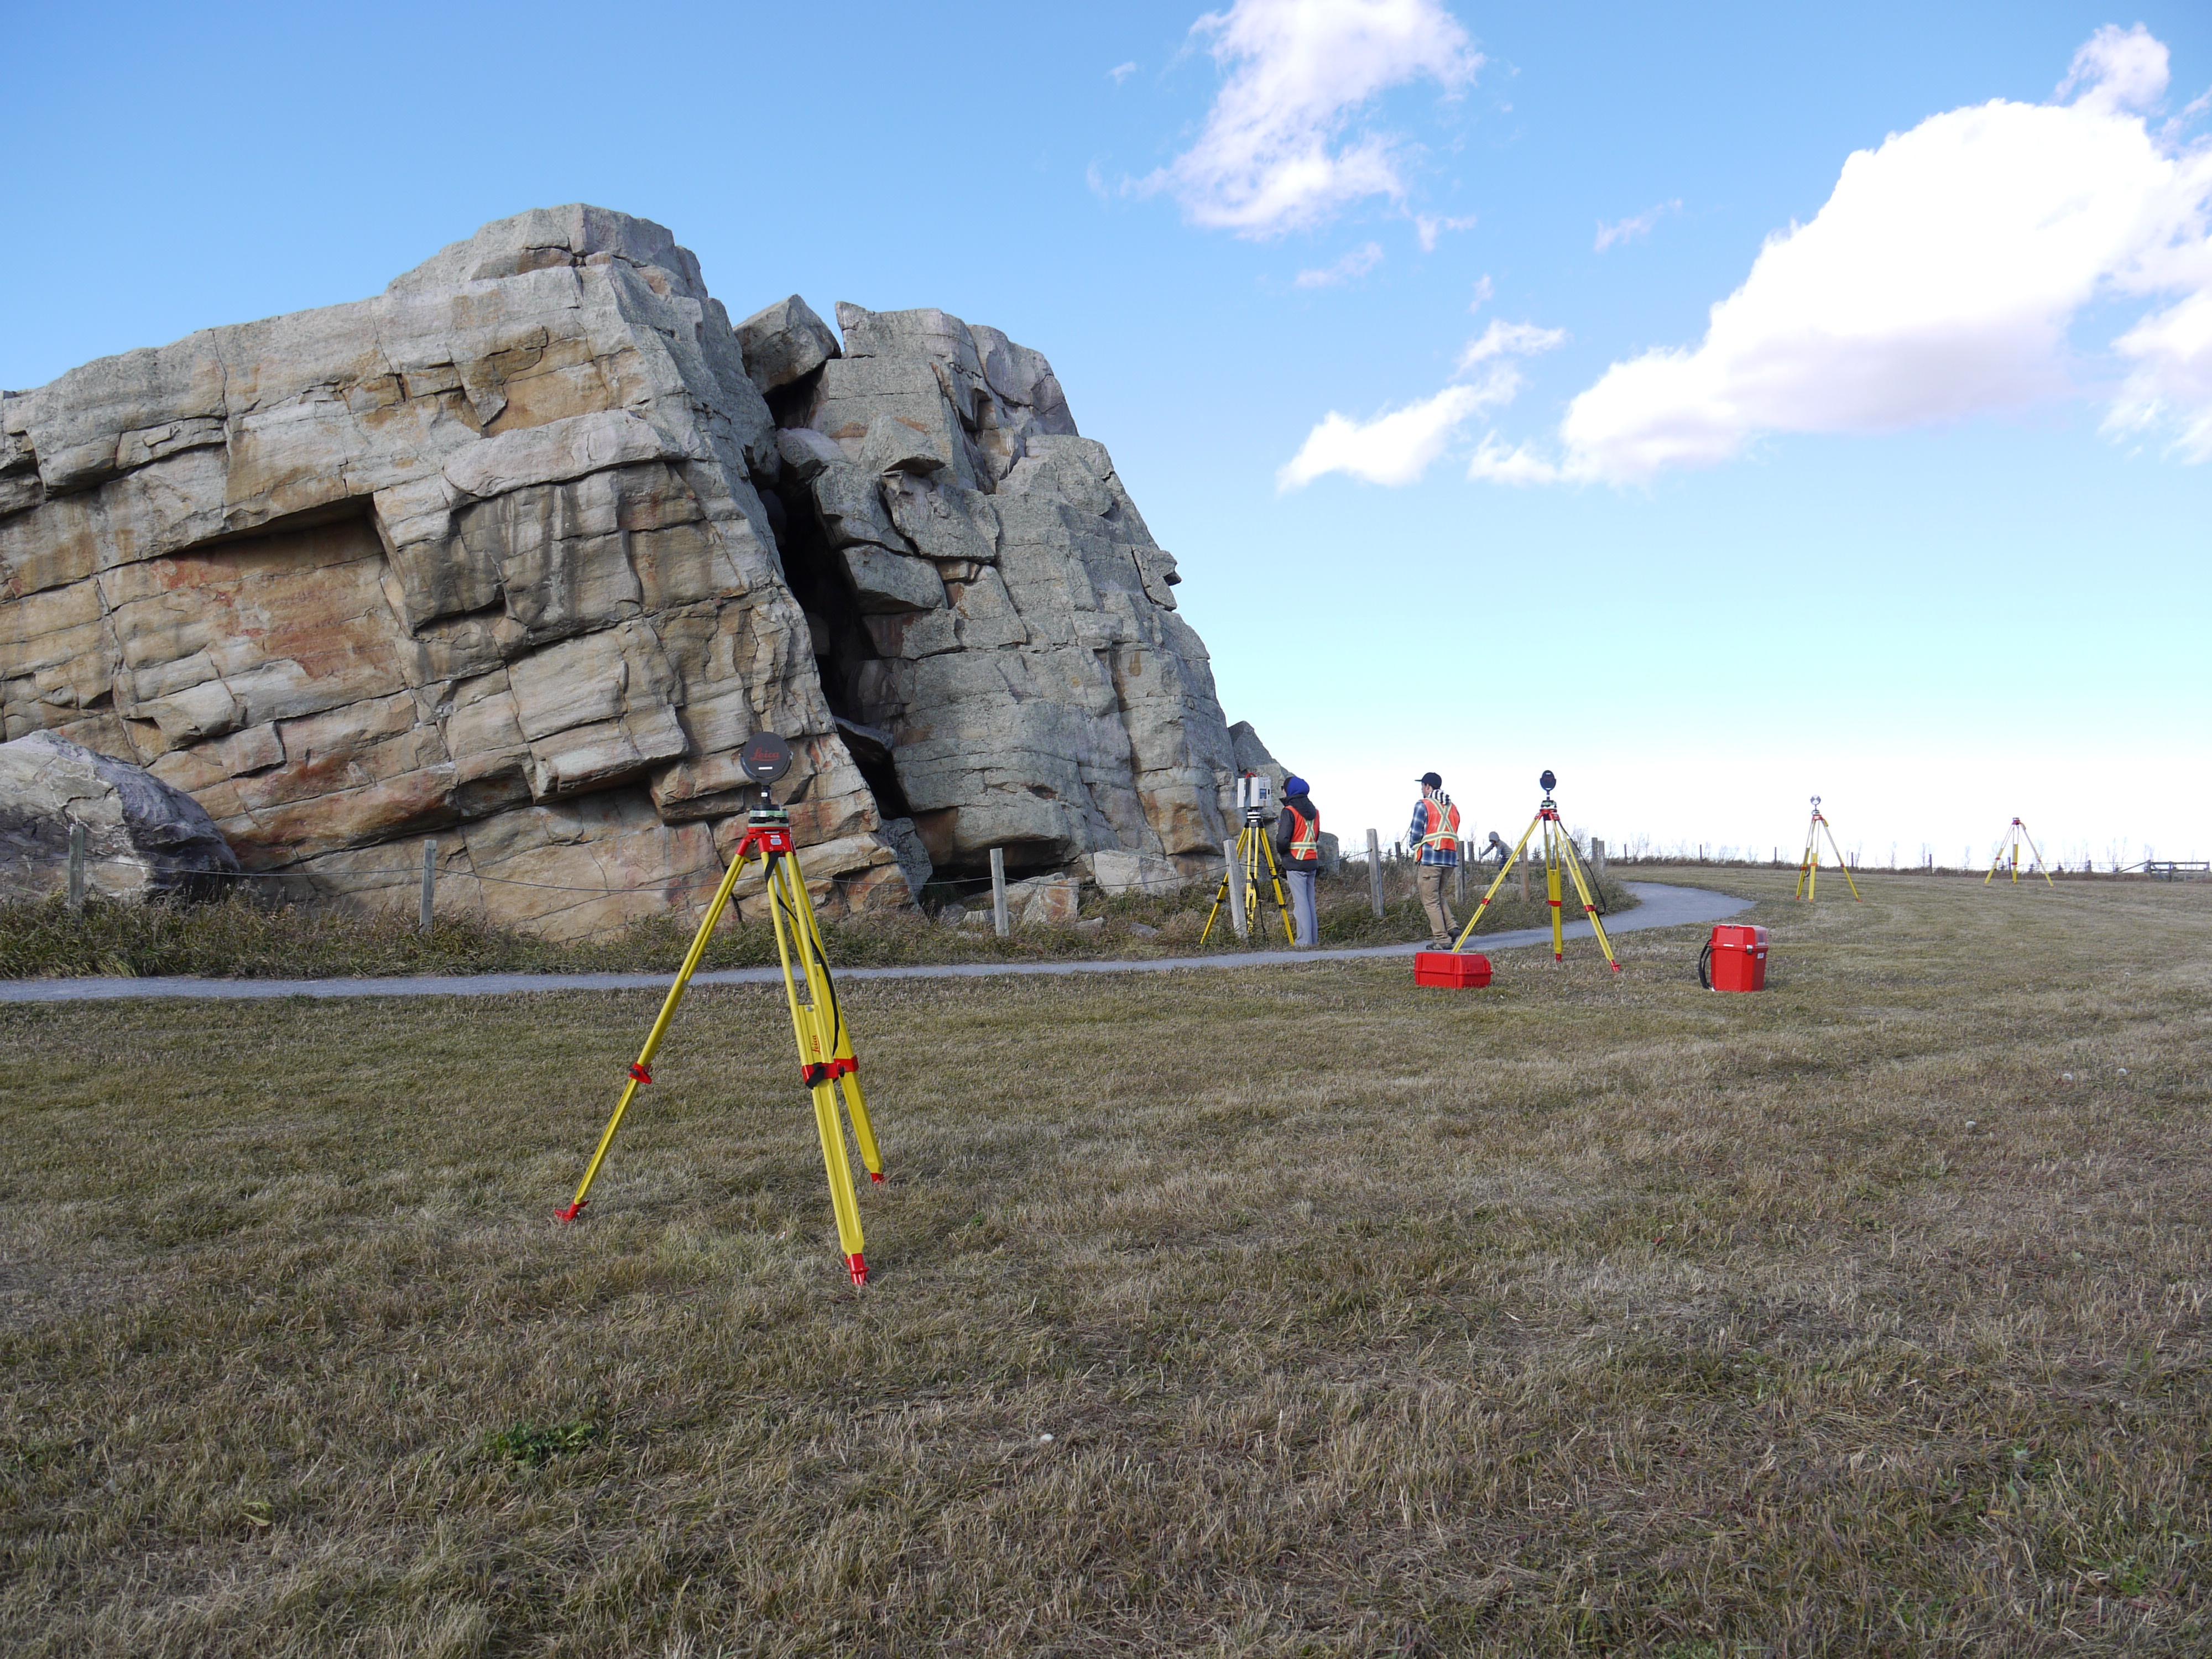 Geomatics Engineering students laser scanning Okotoks Erratic, October 2016.